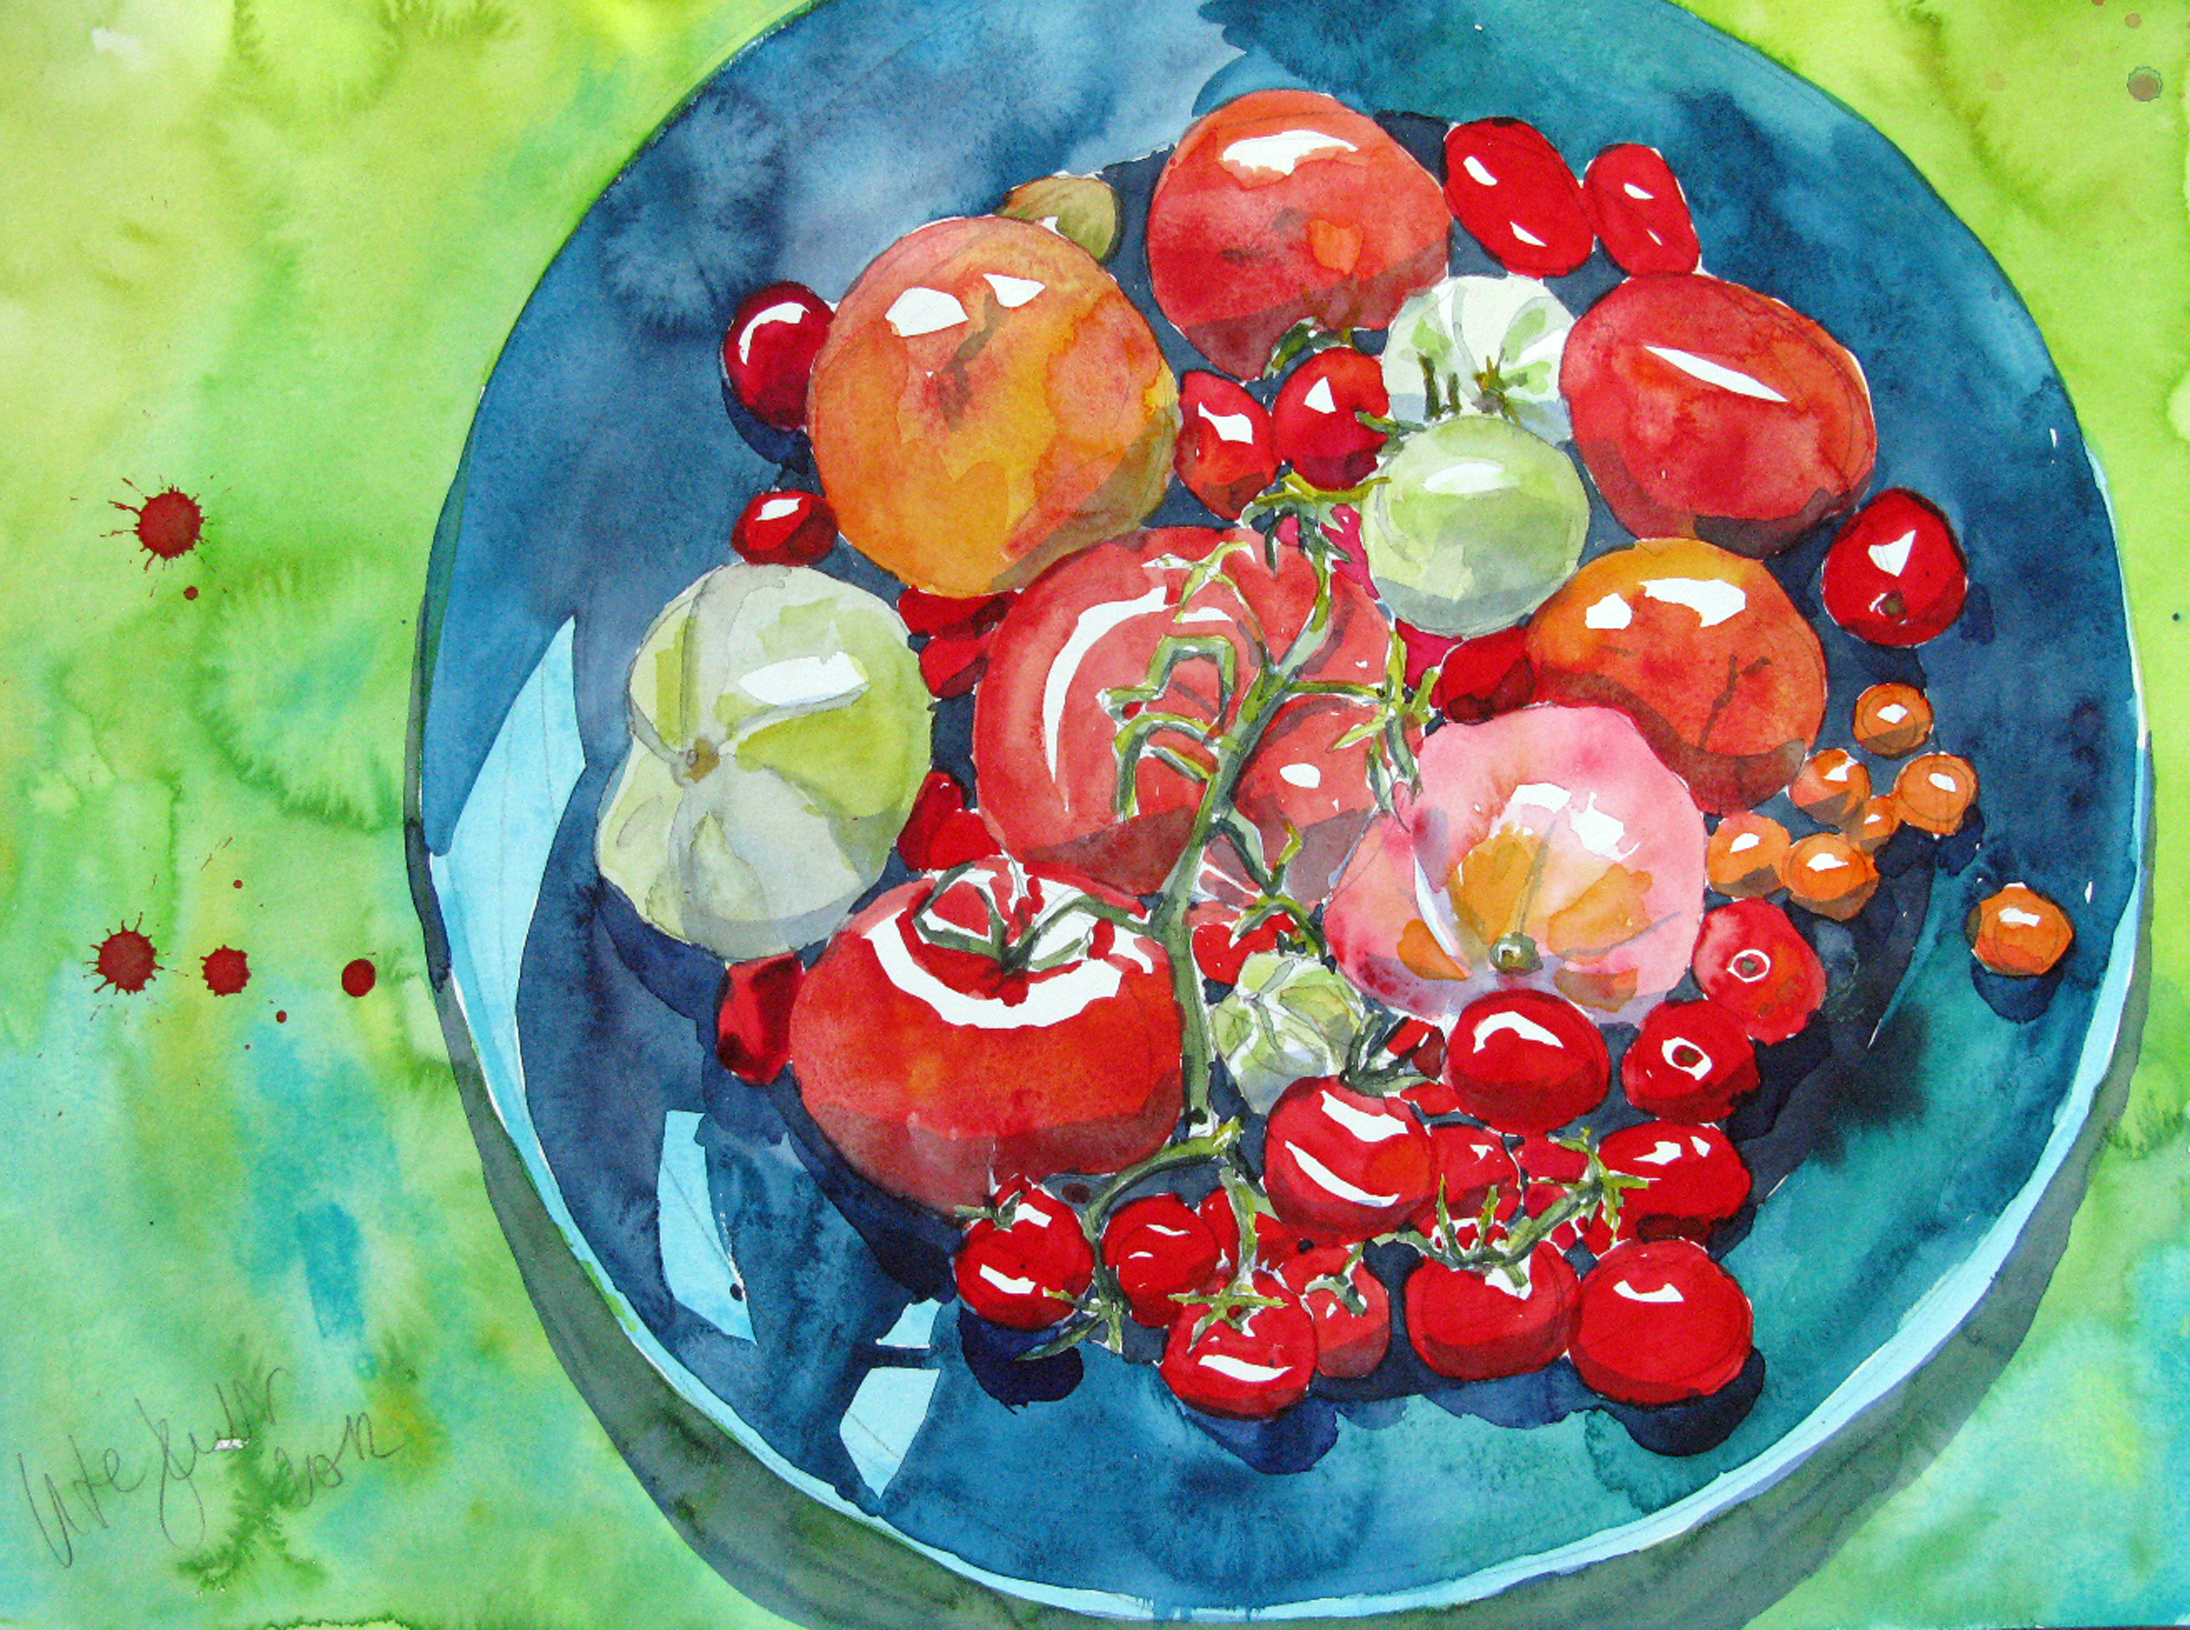 letzte Tomaten 300 dpi